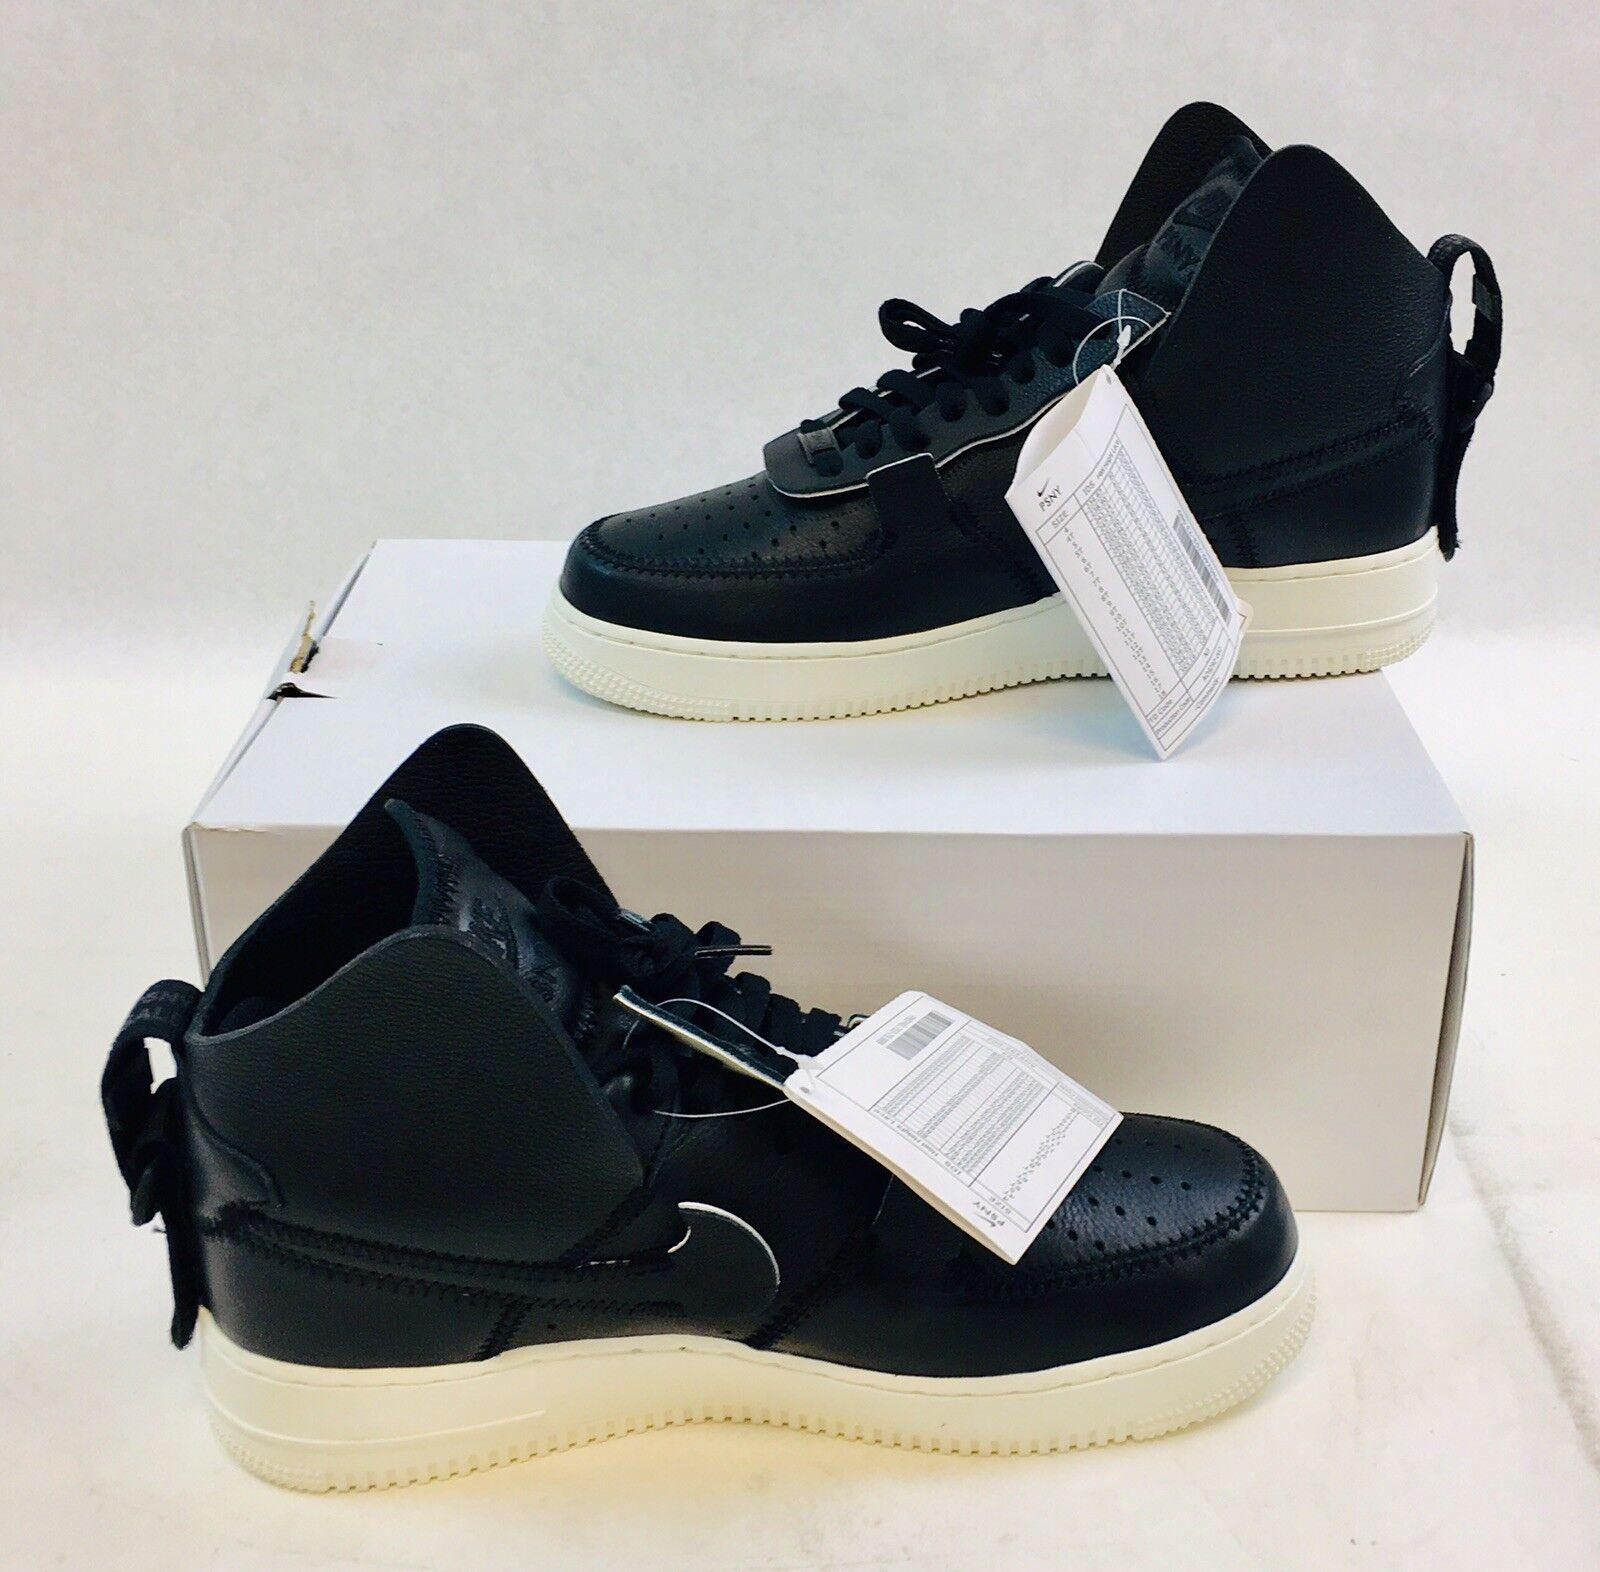 PSNY x Nike - Air Force Force Force 1 High - Black Black-Sail - Men's Size 9.5 - NEW W  BOX 537512